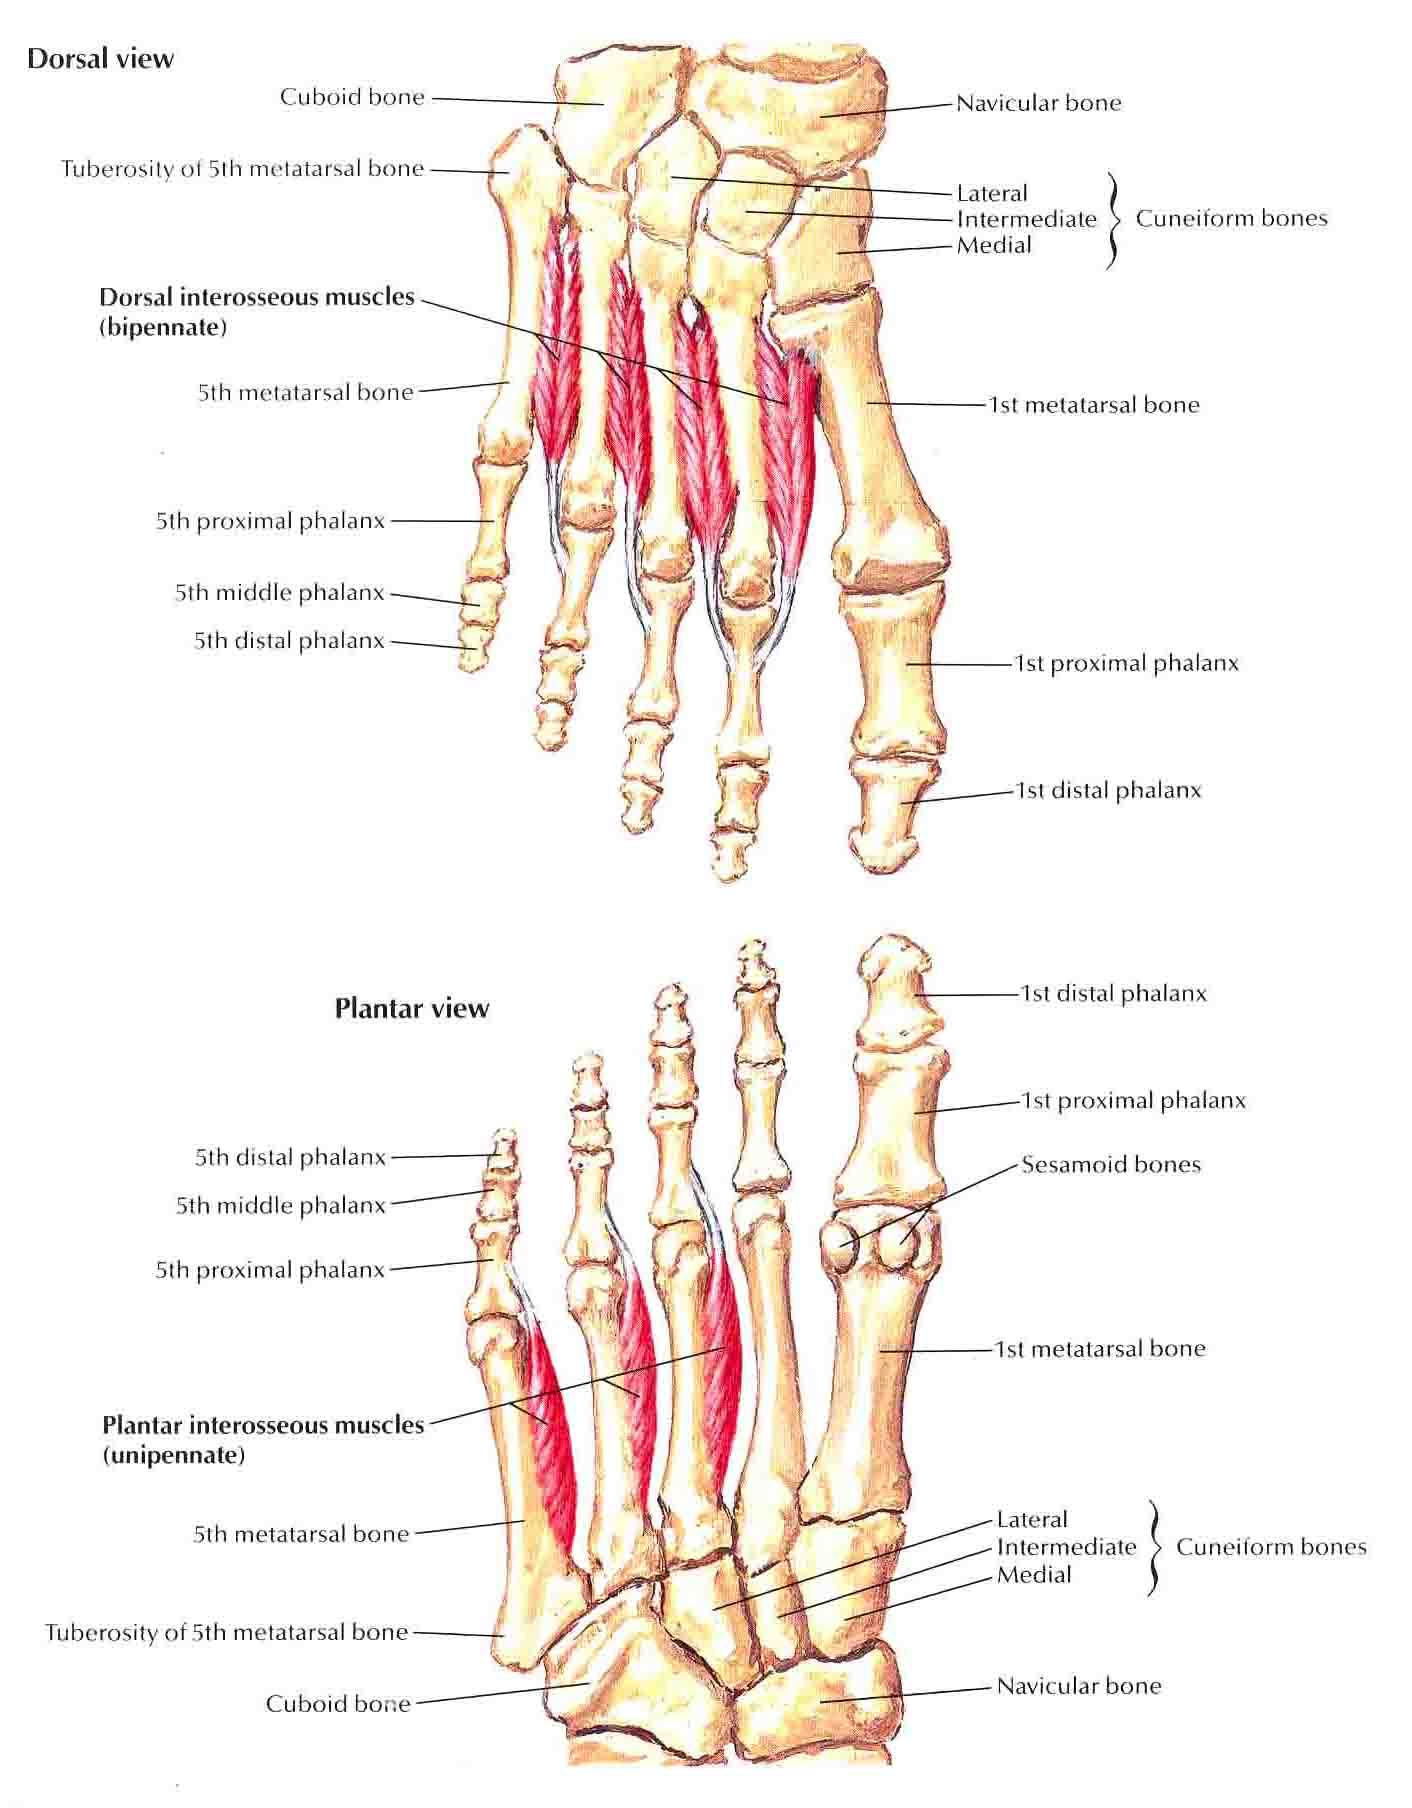 011B - Dorsum and Plantar Aspect of Foot (Anatomy) Flashcards   Memorang